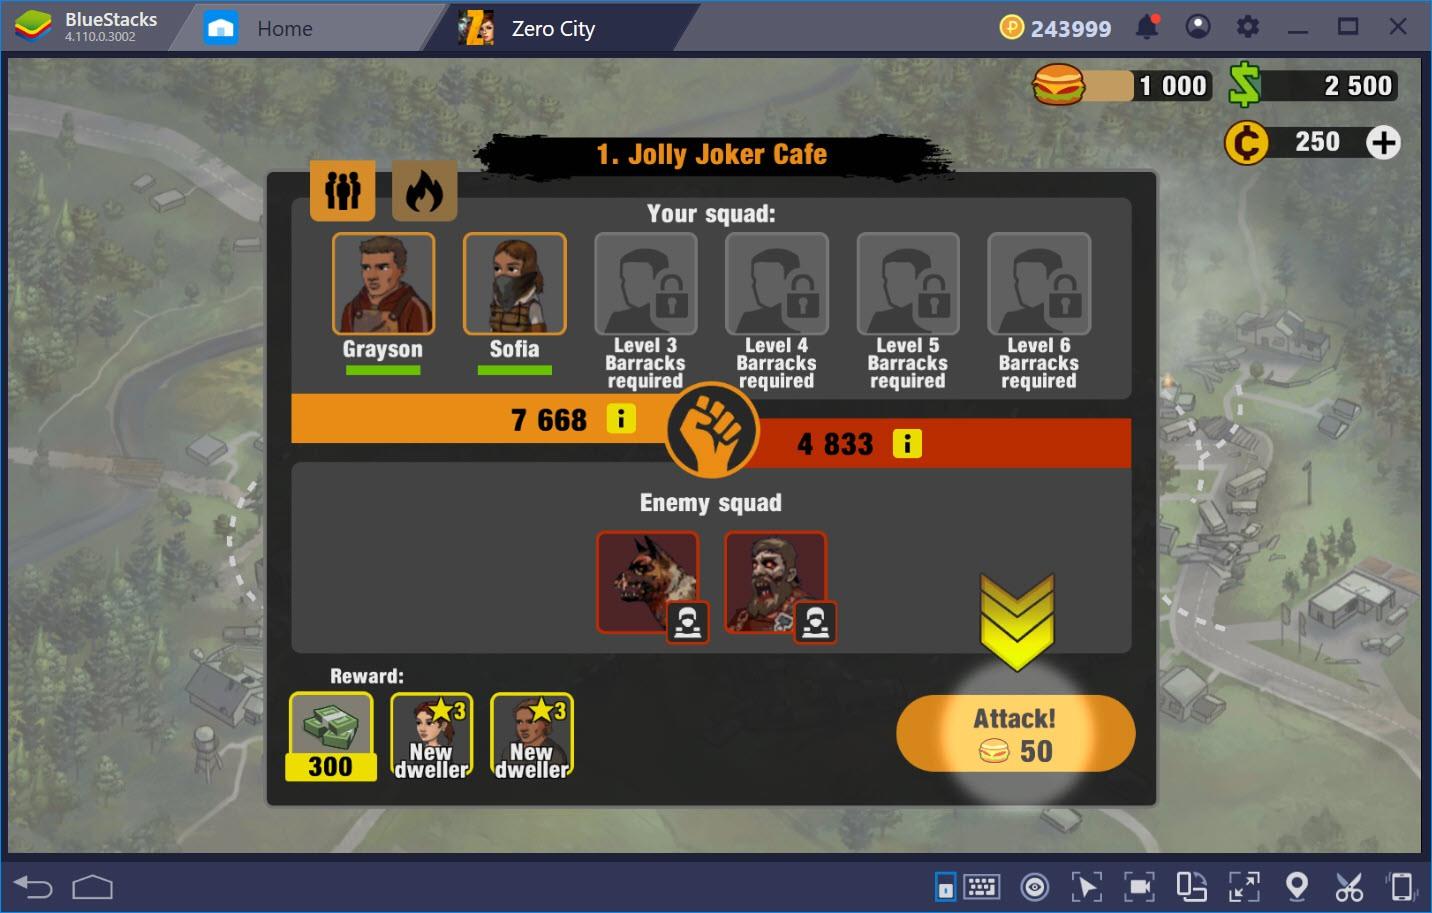 Khám phá Zero City: Zombie Shelter Survival trên PC với BlueStacks